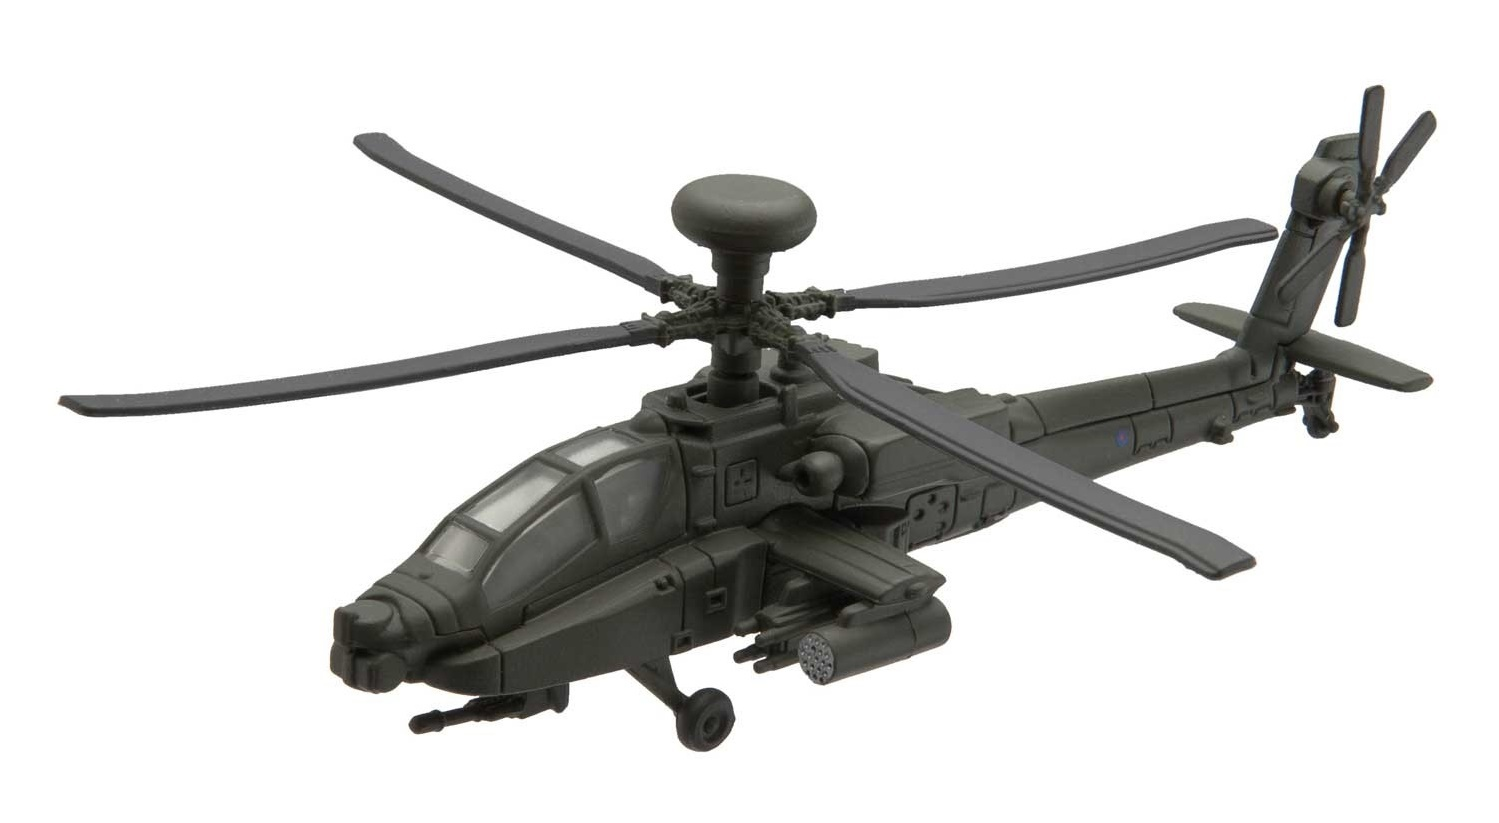 Corgi: Showcase Apache - Diecast Model image